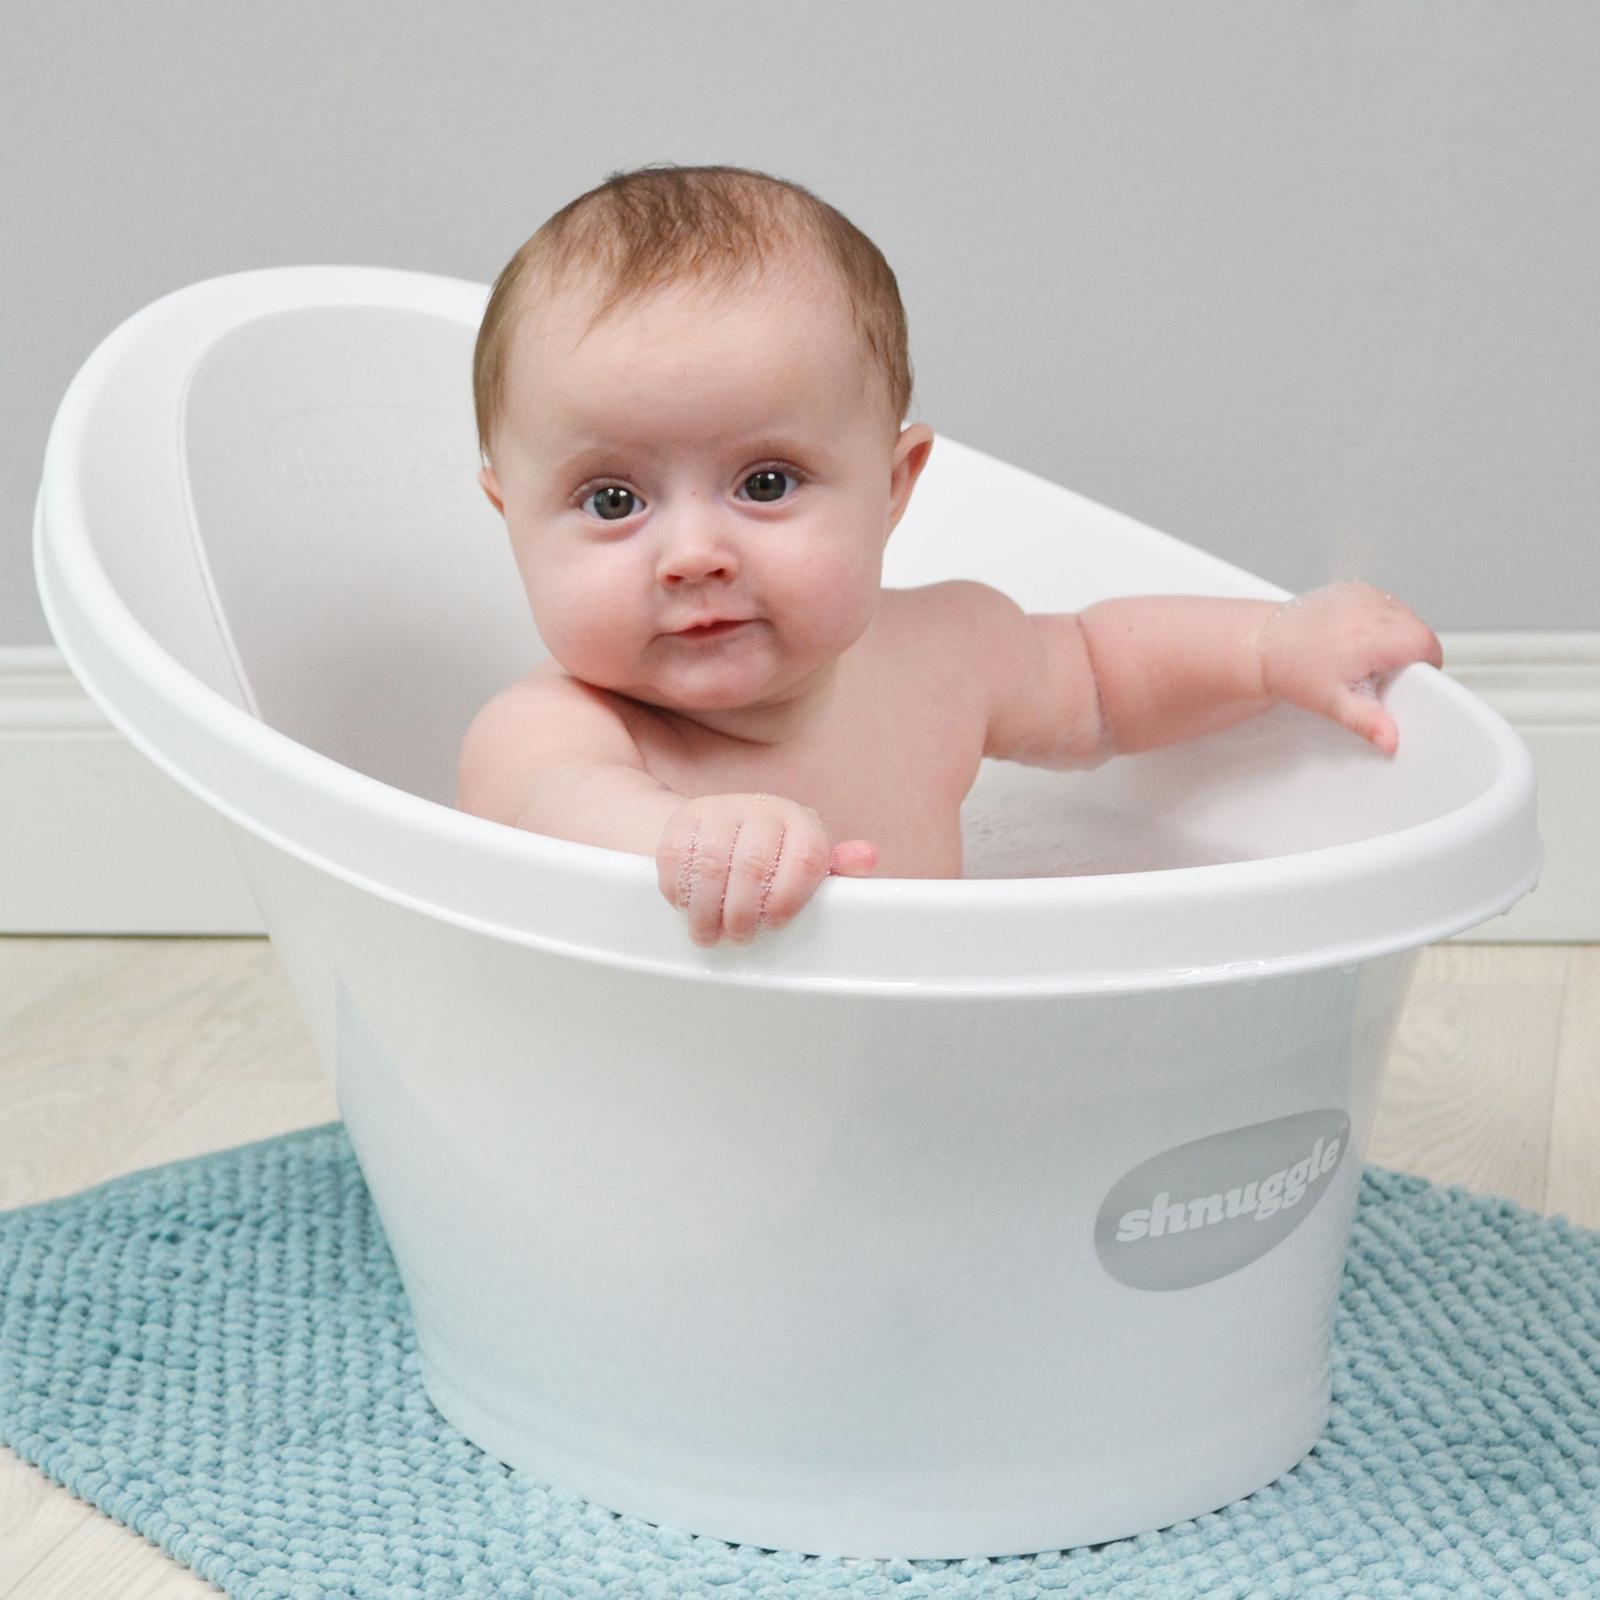 Shnuggle Baby Bath - Grey | Buy at Online4baby